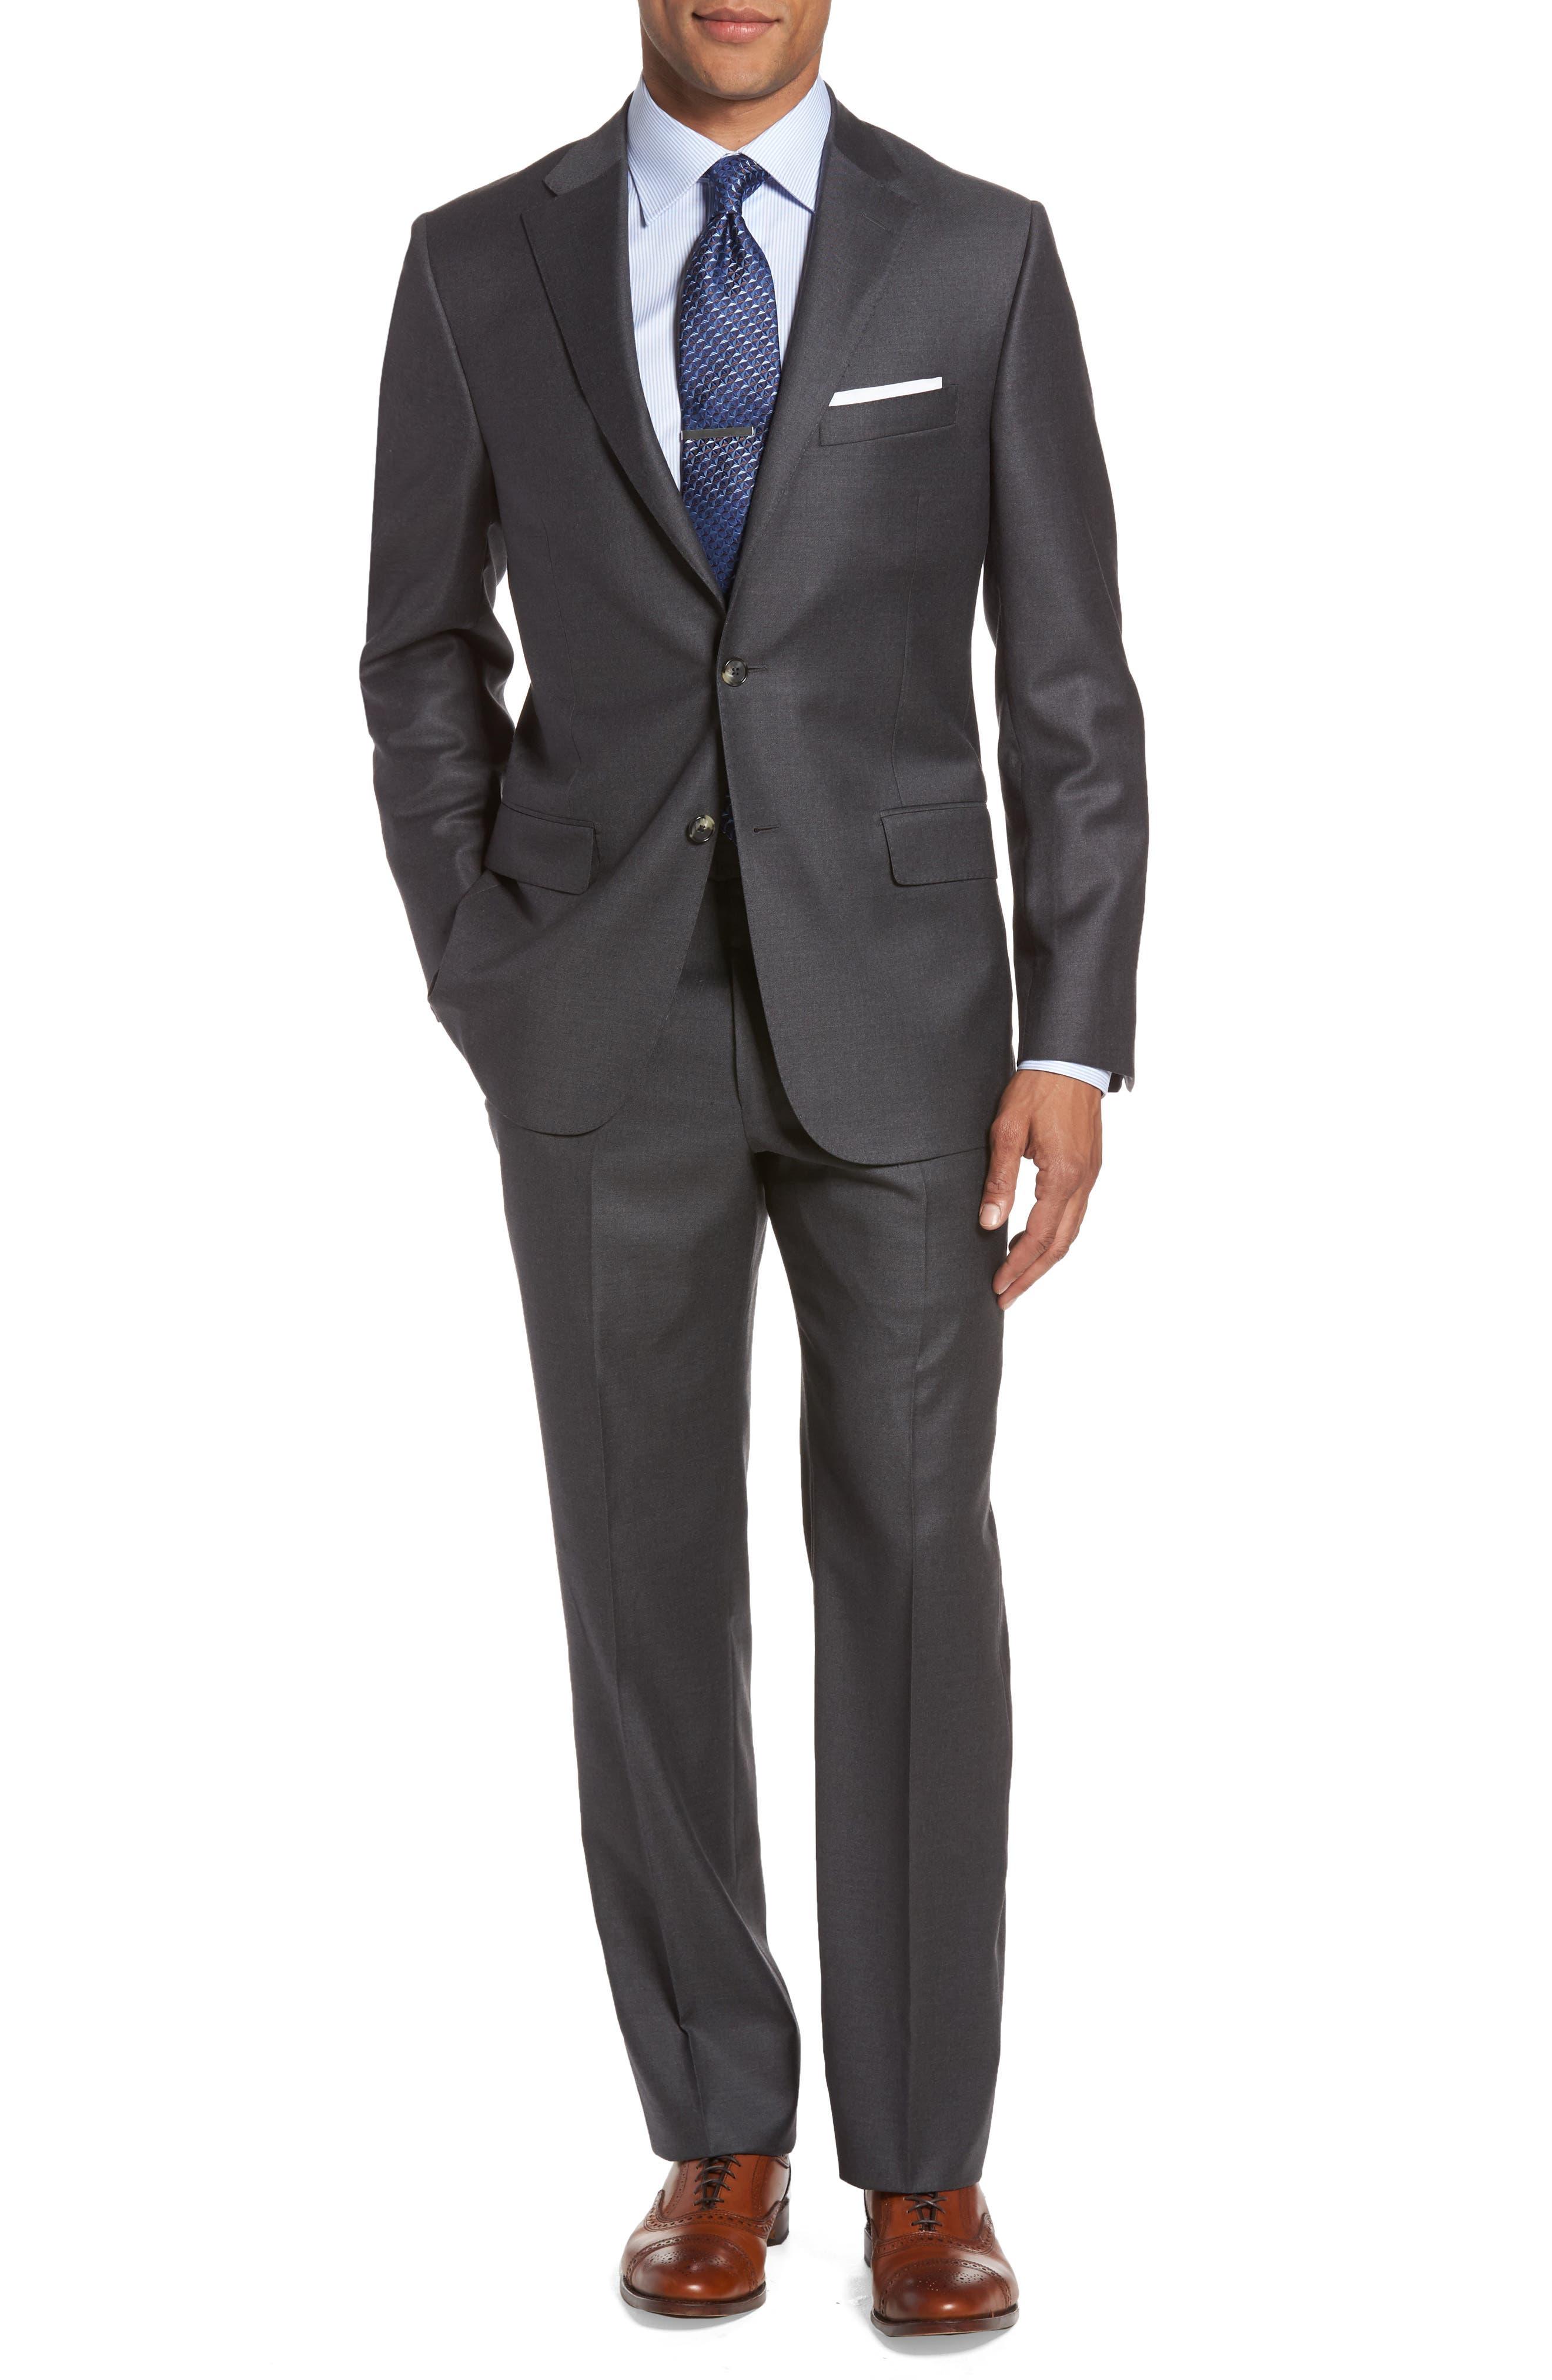 HICKEY FREEMAN, Classic B Fit Loro Piana Wool Suit, Main thumbnail 1, color, GREY